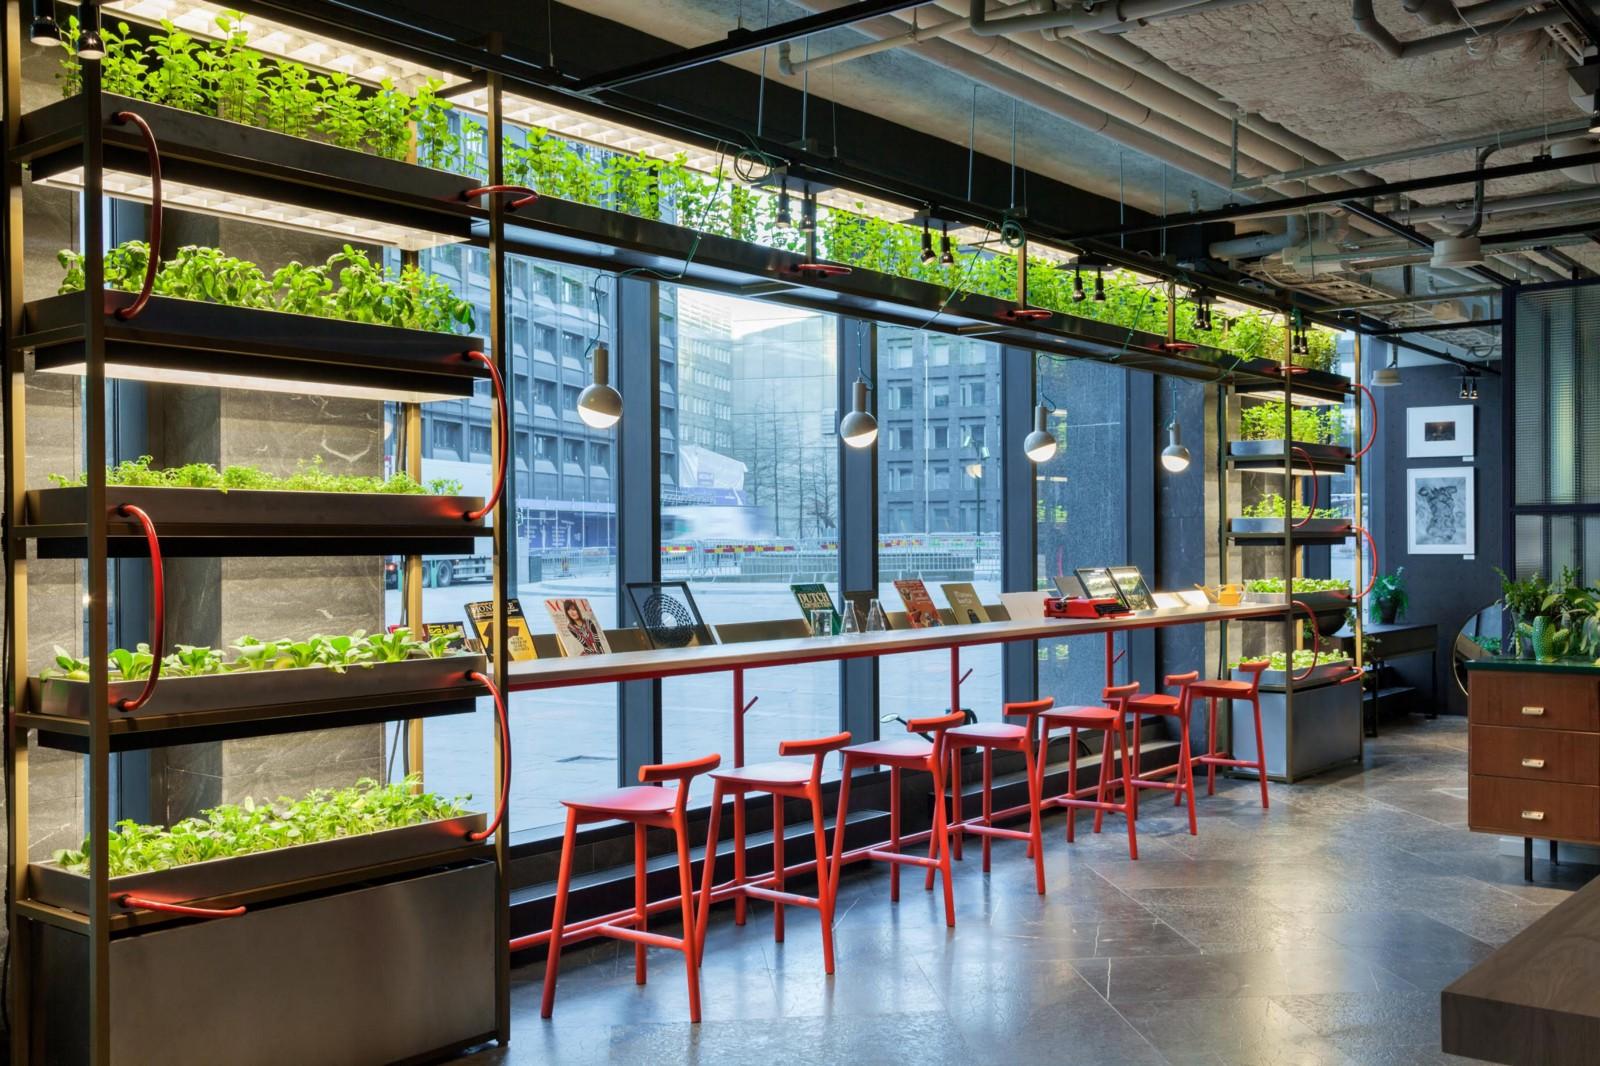 hobo-hotel-urban-farming-environmental-friendly